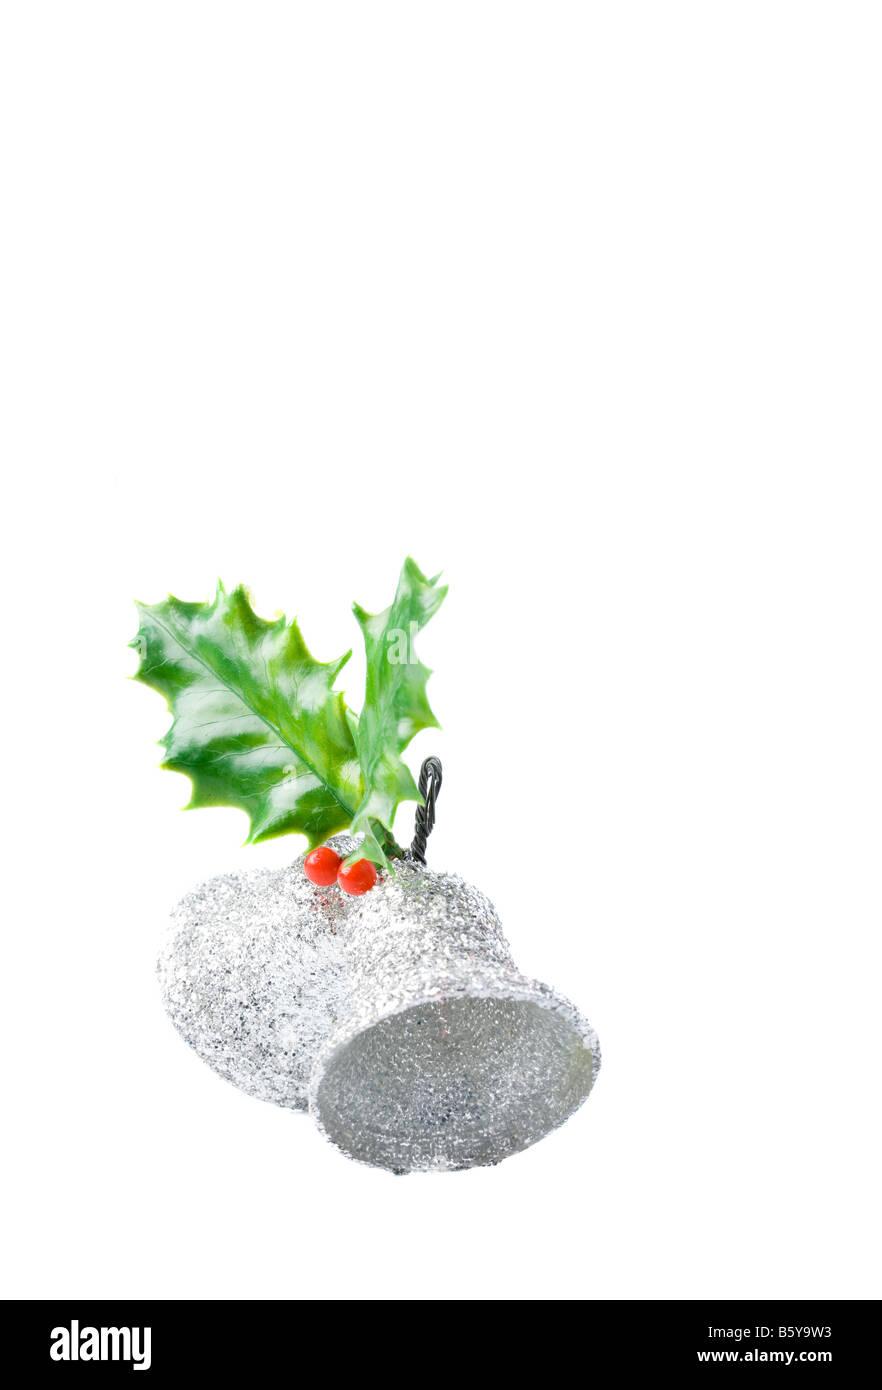 seasonal christmas ornaments tu put in the xmas tree - Stock Image